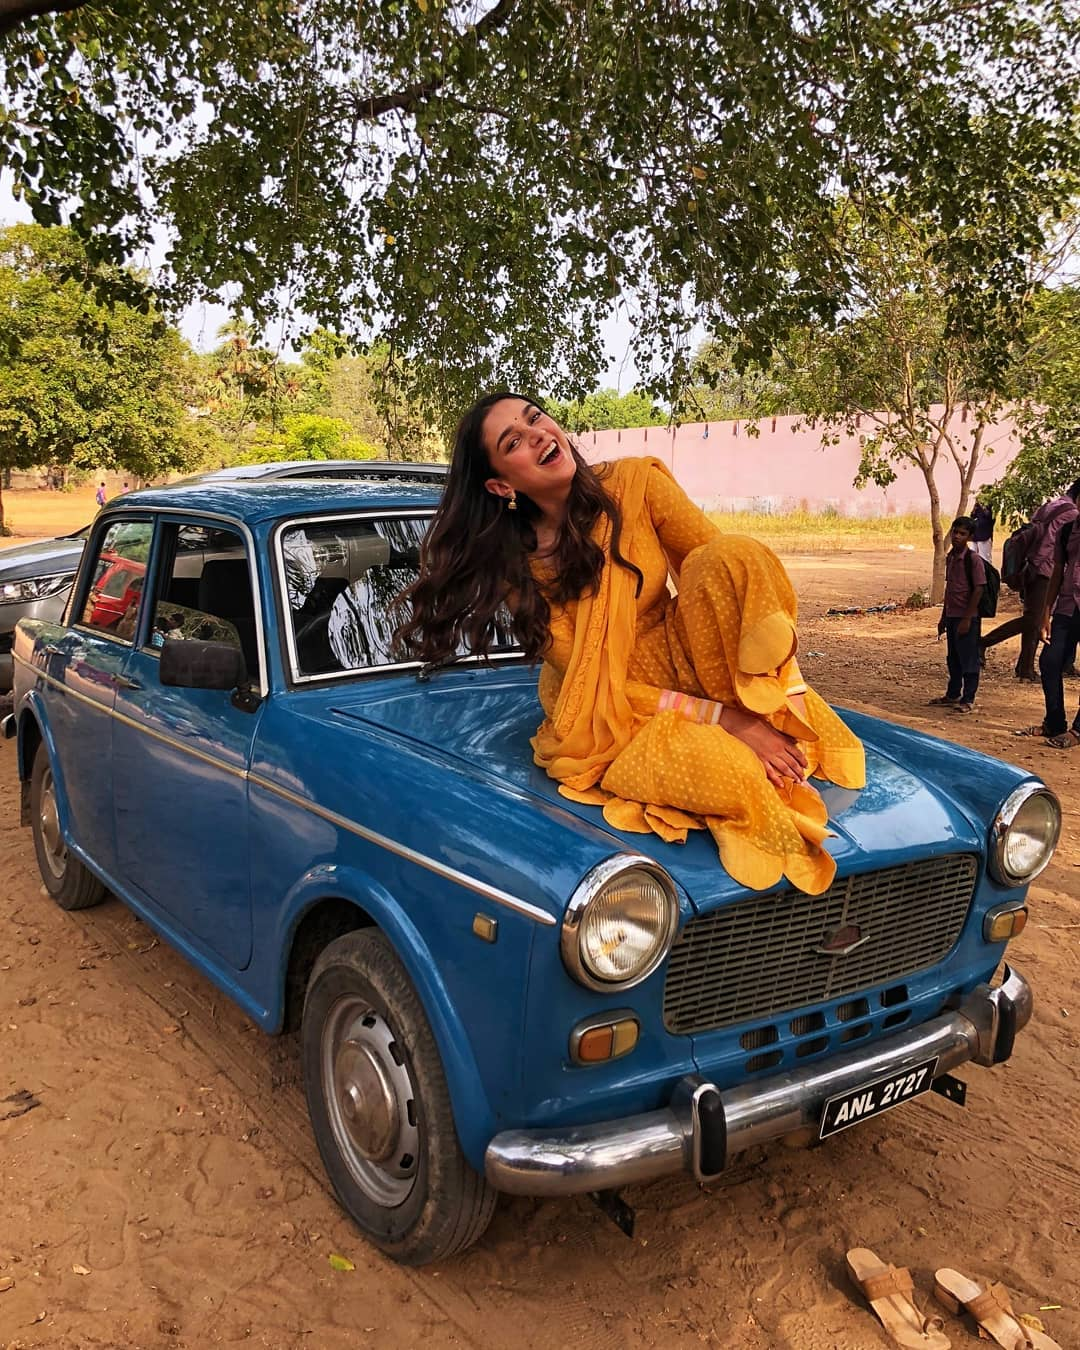 Punjabi Bollywood Tadka,ਅਦਿਤੀ ਰਾਓ ਹੈਦਰੀ ਇਮੇਜ਼ ਐਚਡੀ ਫੋਟੋ ਡਾਊਨਲੋਡ,aditi rao hydari image hd photo download